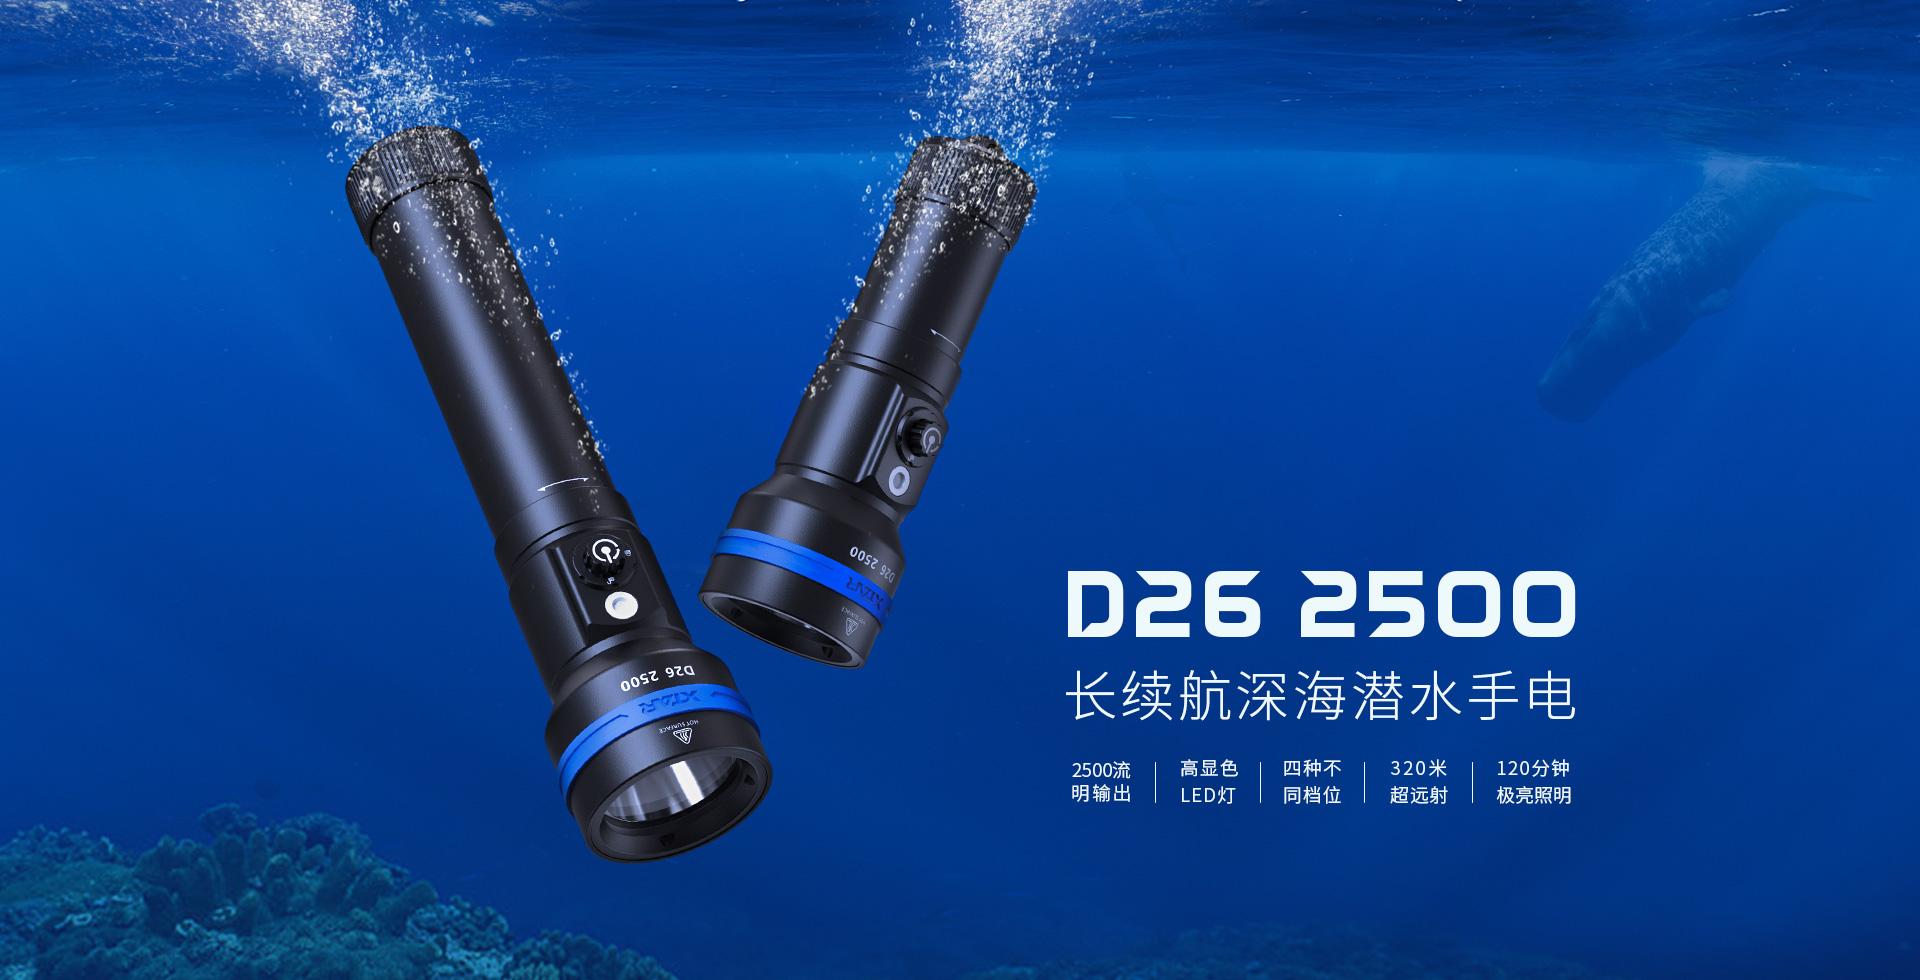 D26-2500中文首焦图.jpg